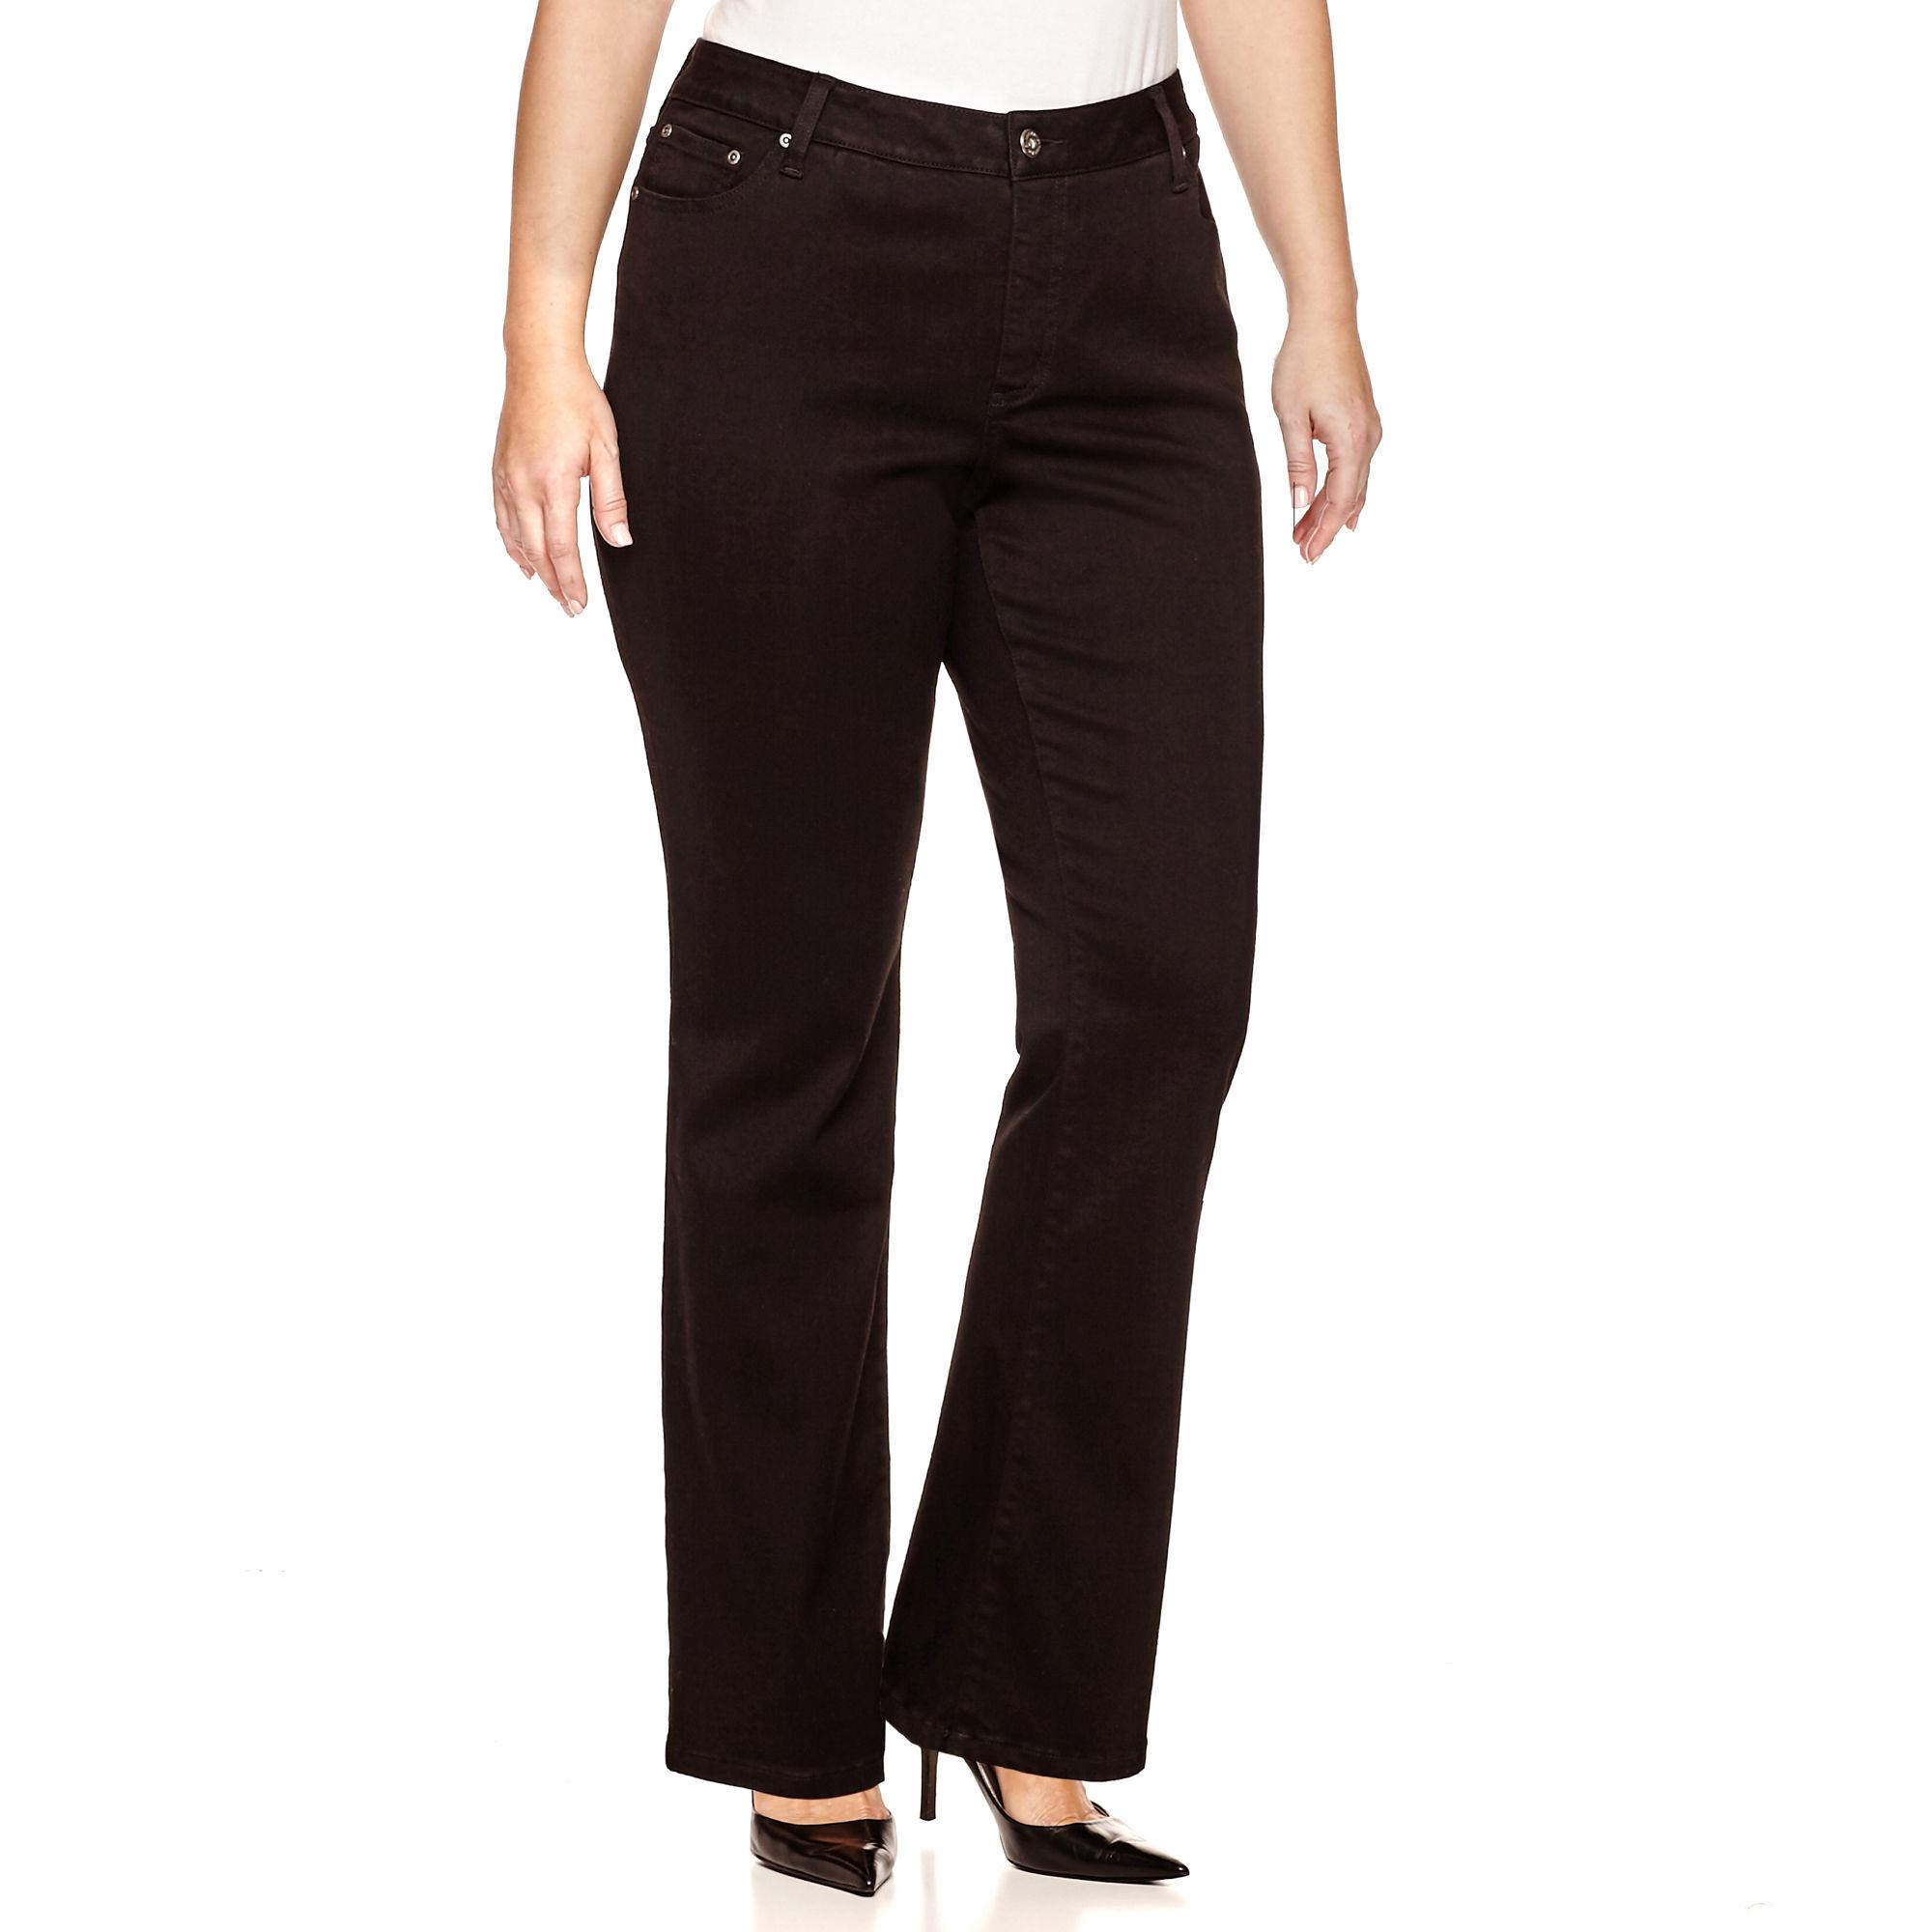 St. John's Bay Secretly Slender Bootcut Jeans - Plus